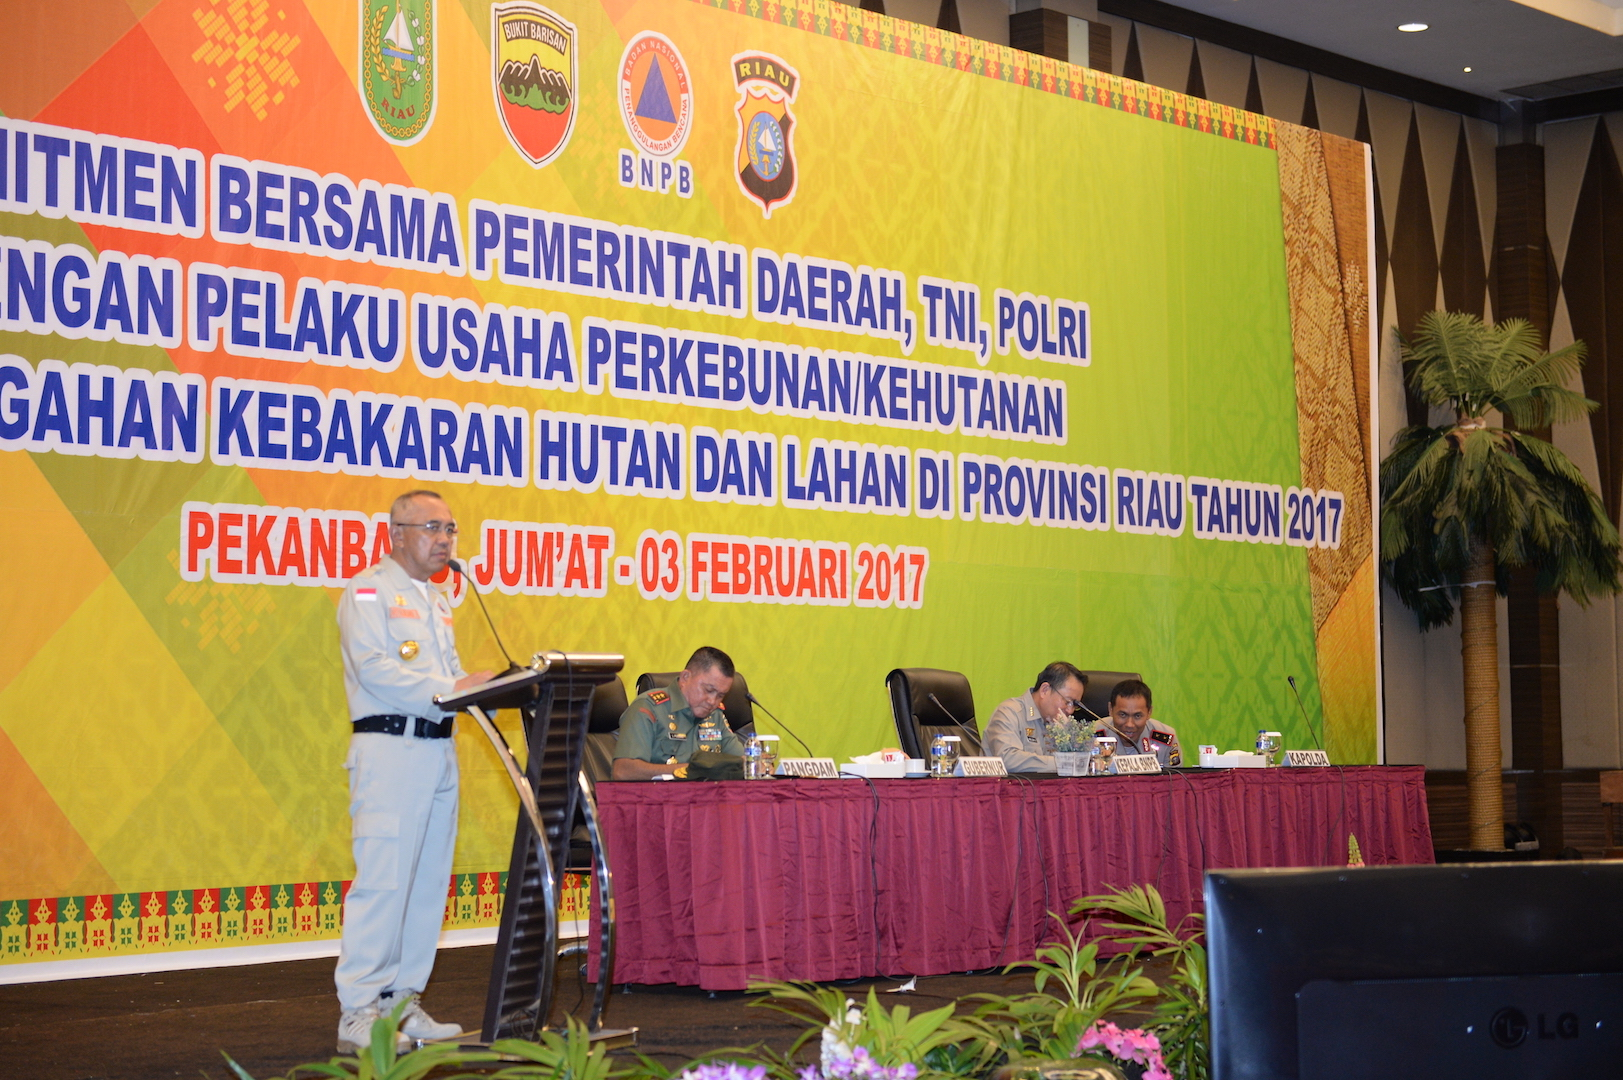 Gubri memberikan sambutan saat Komitmen Bersama Pemerintah Daerah, TNI, POLRI dengan Pelaku Usaha Perkebunan_Kehutanan dalam Rangka Pencegahan KARHUTLA di Prov Riau Tahun 2017 di H Pangeran